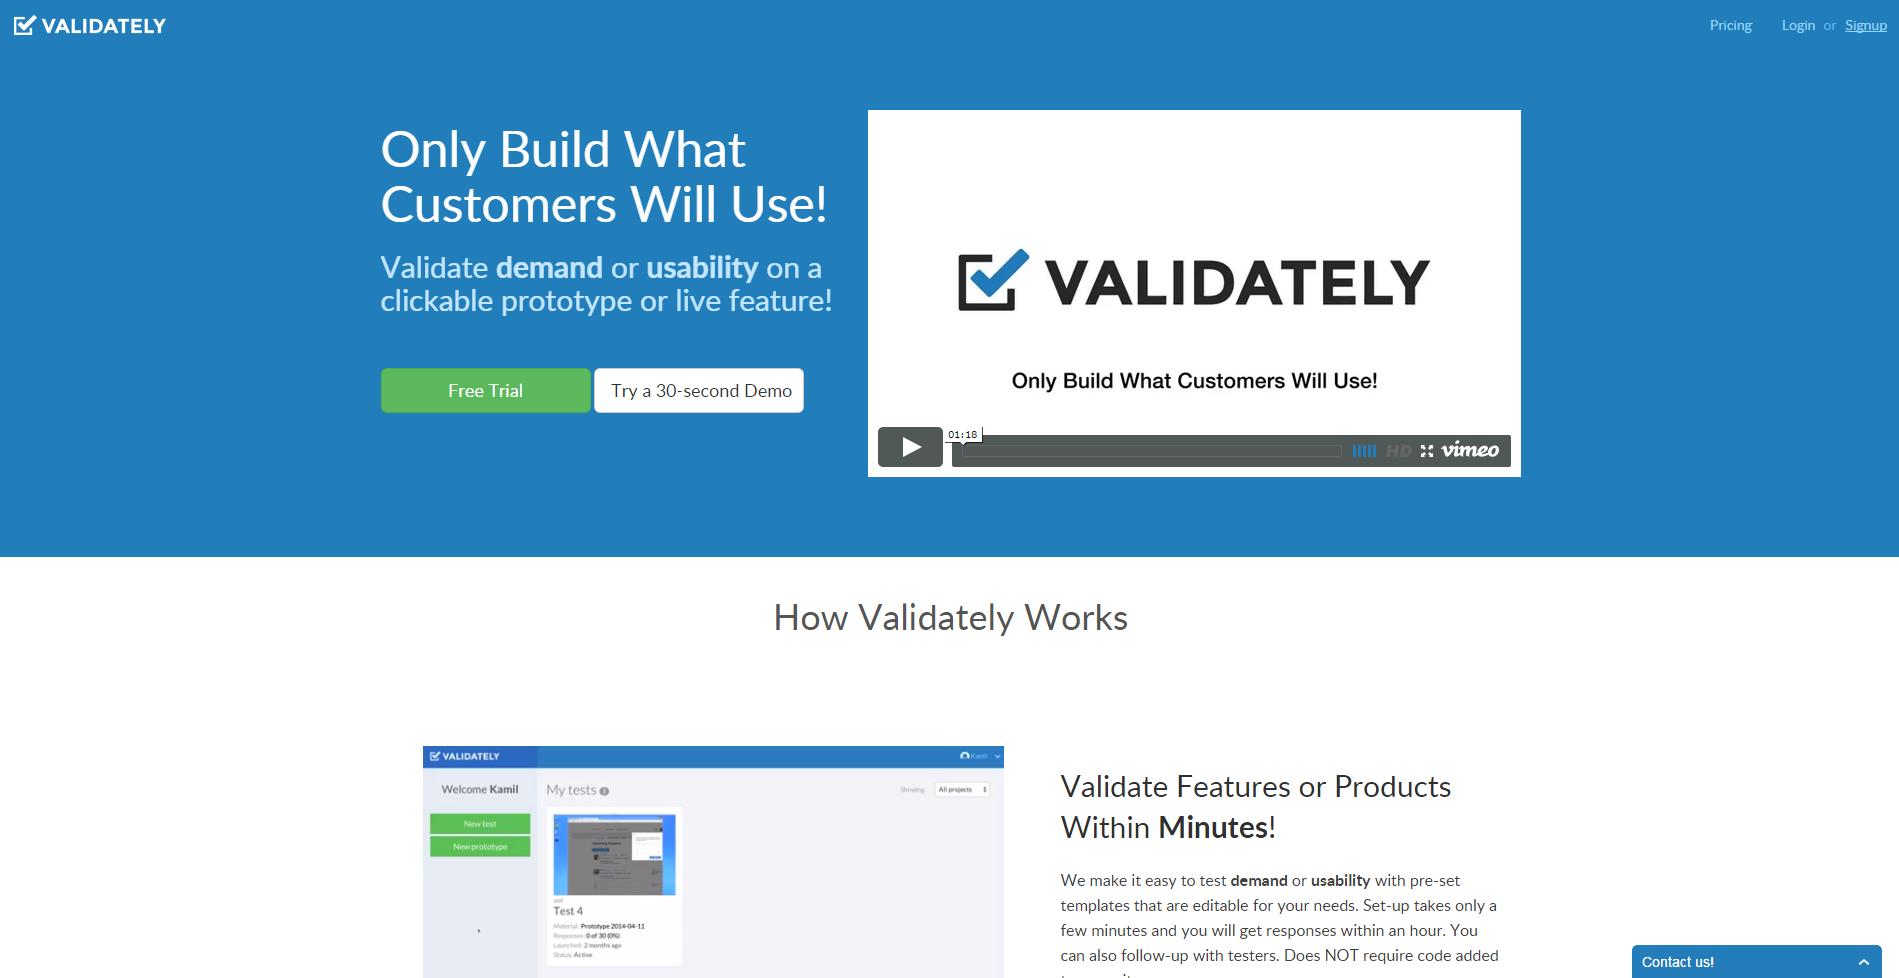 Validately - validate demand or usability